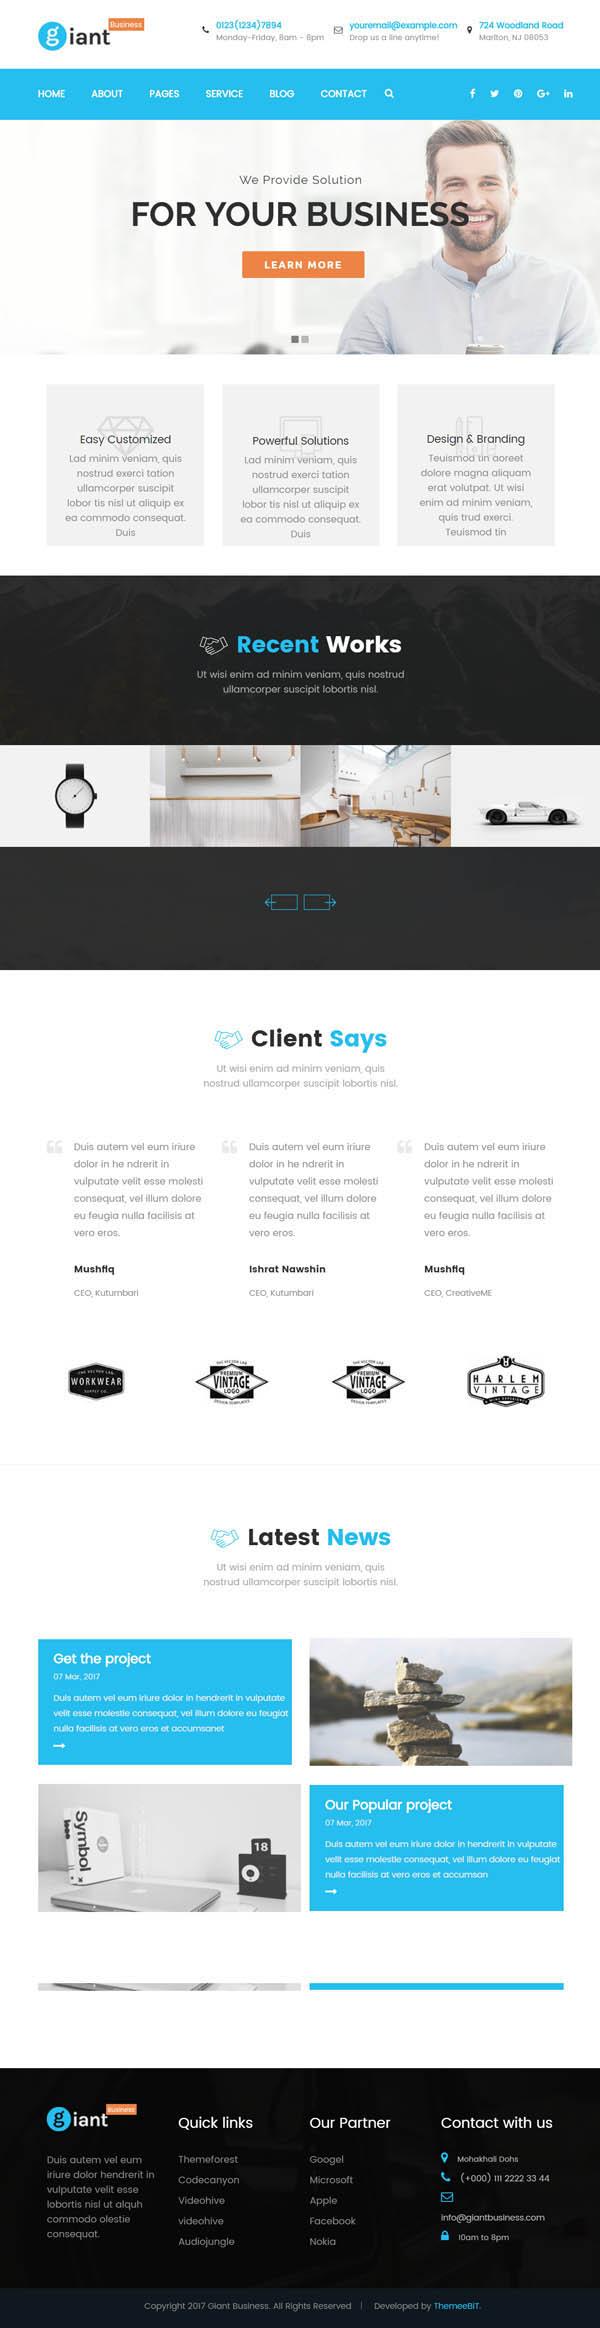 Giant Business : Multipurpose Agency & Corporate WordPress Theme